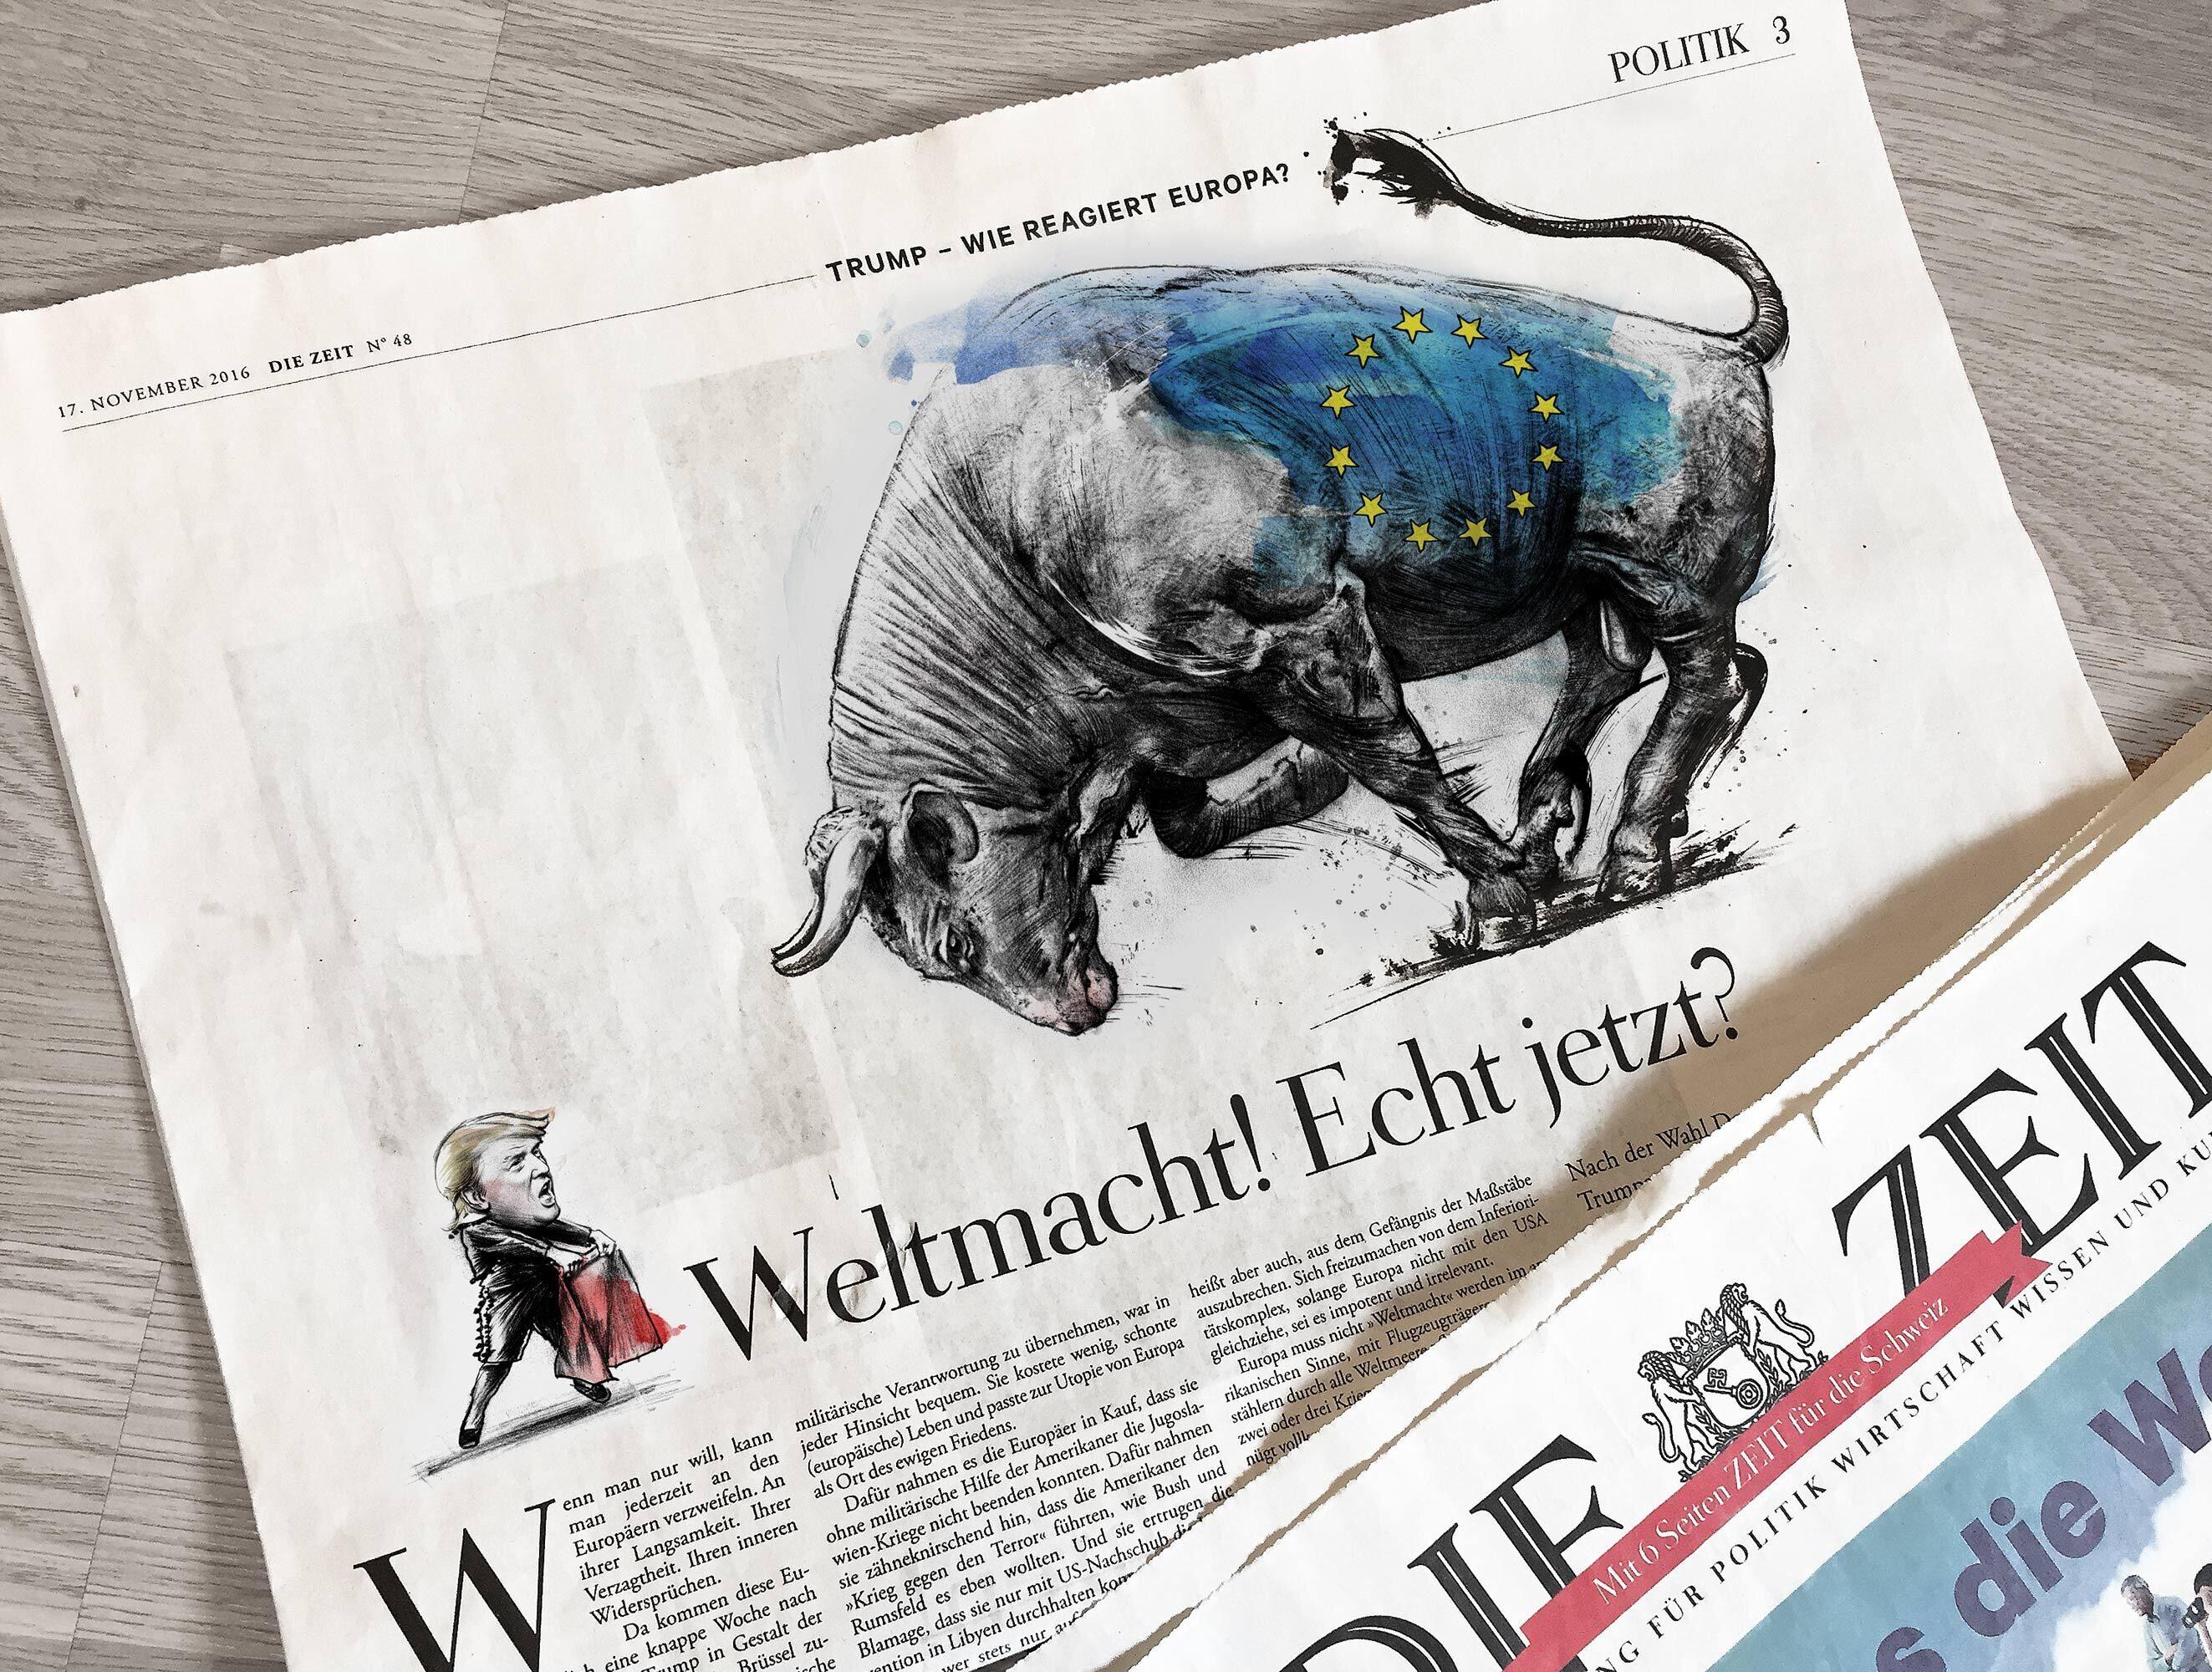 Editorial illustration die zeit donald trump europa - Kornel Illustration   Kornel Stadler portfolio